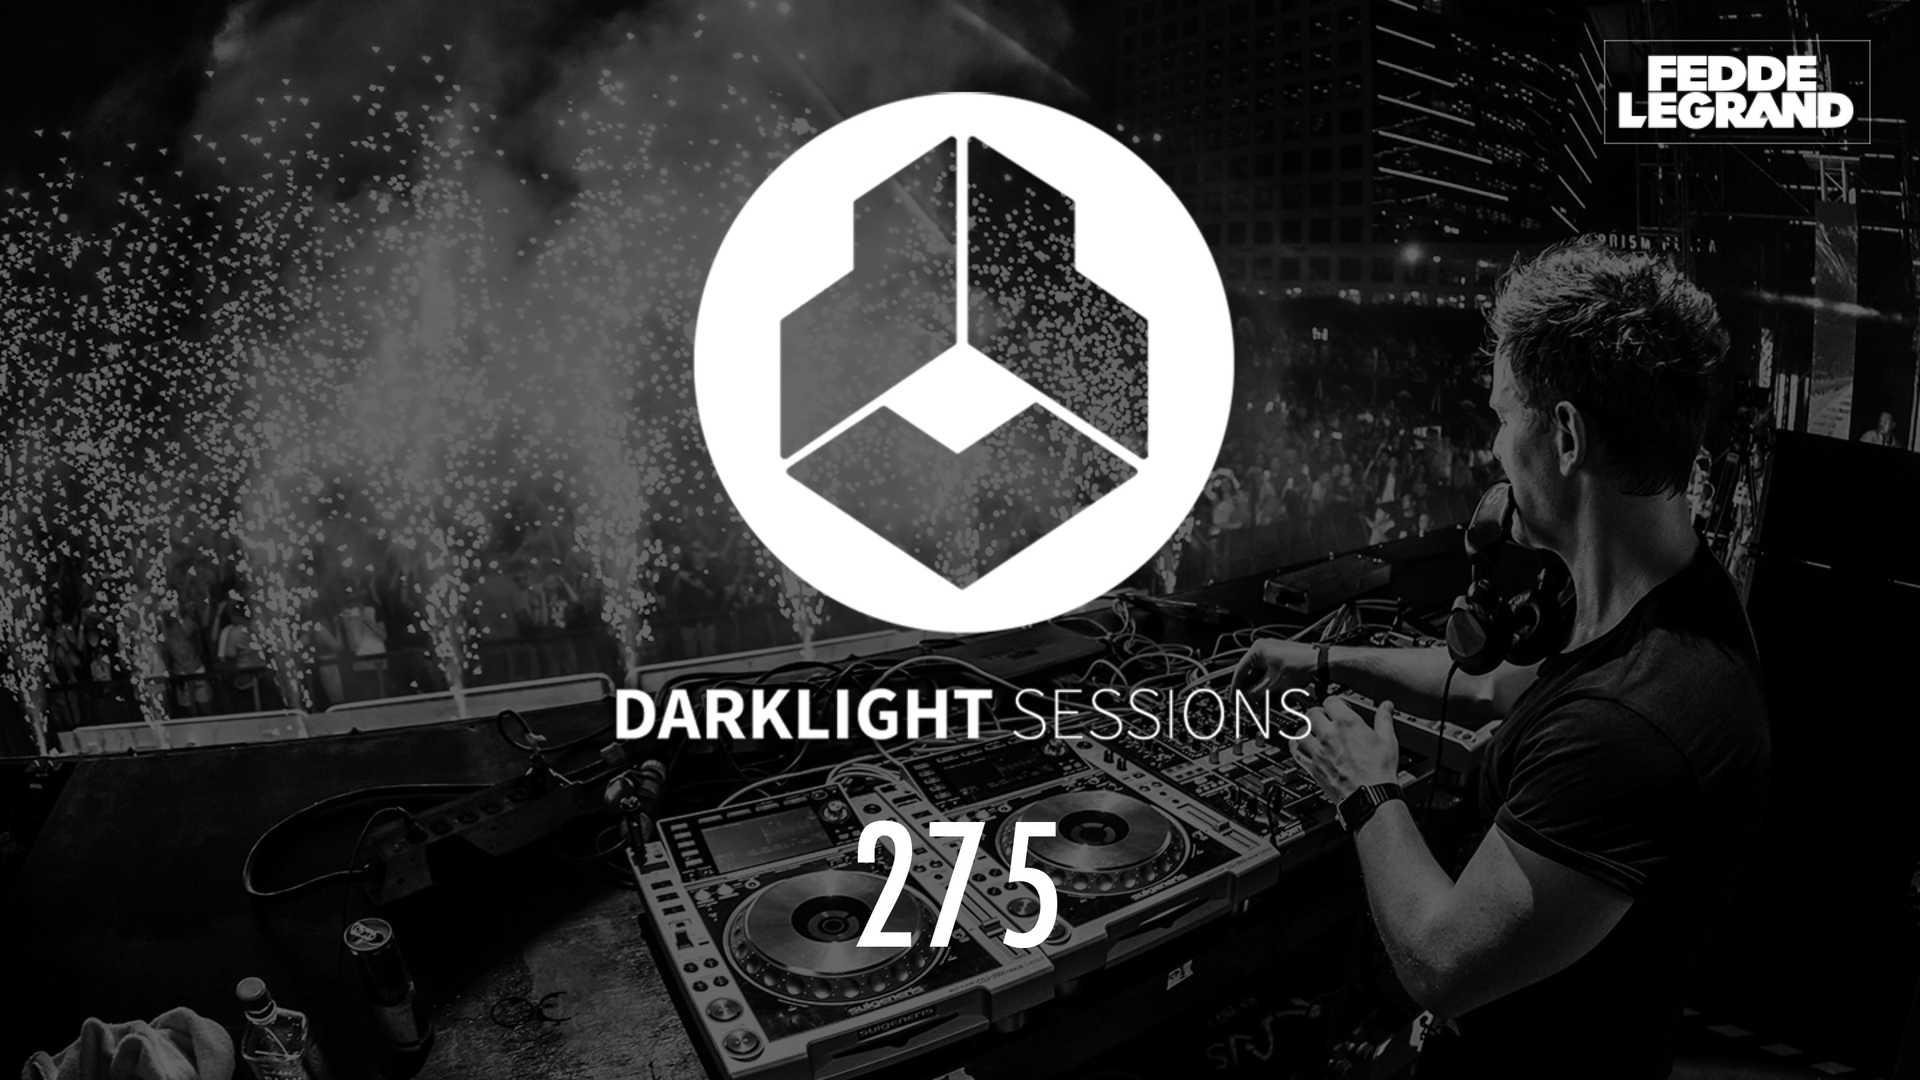 Darklight Sessions 275